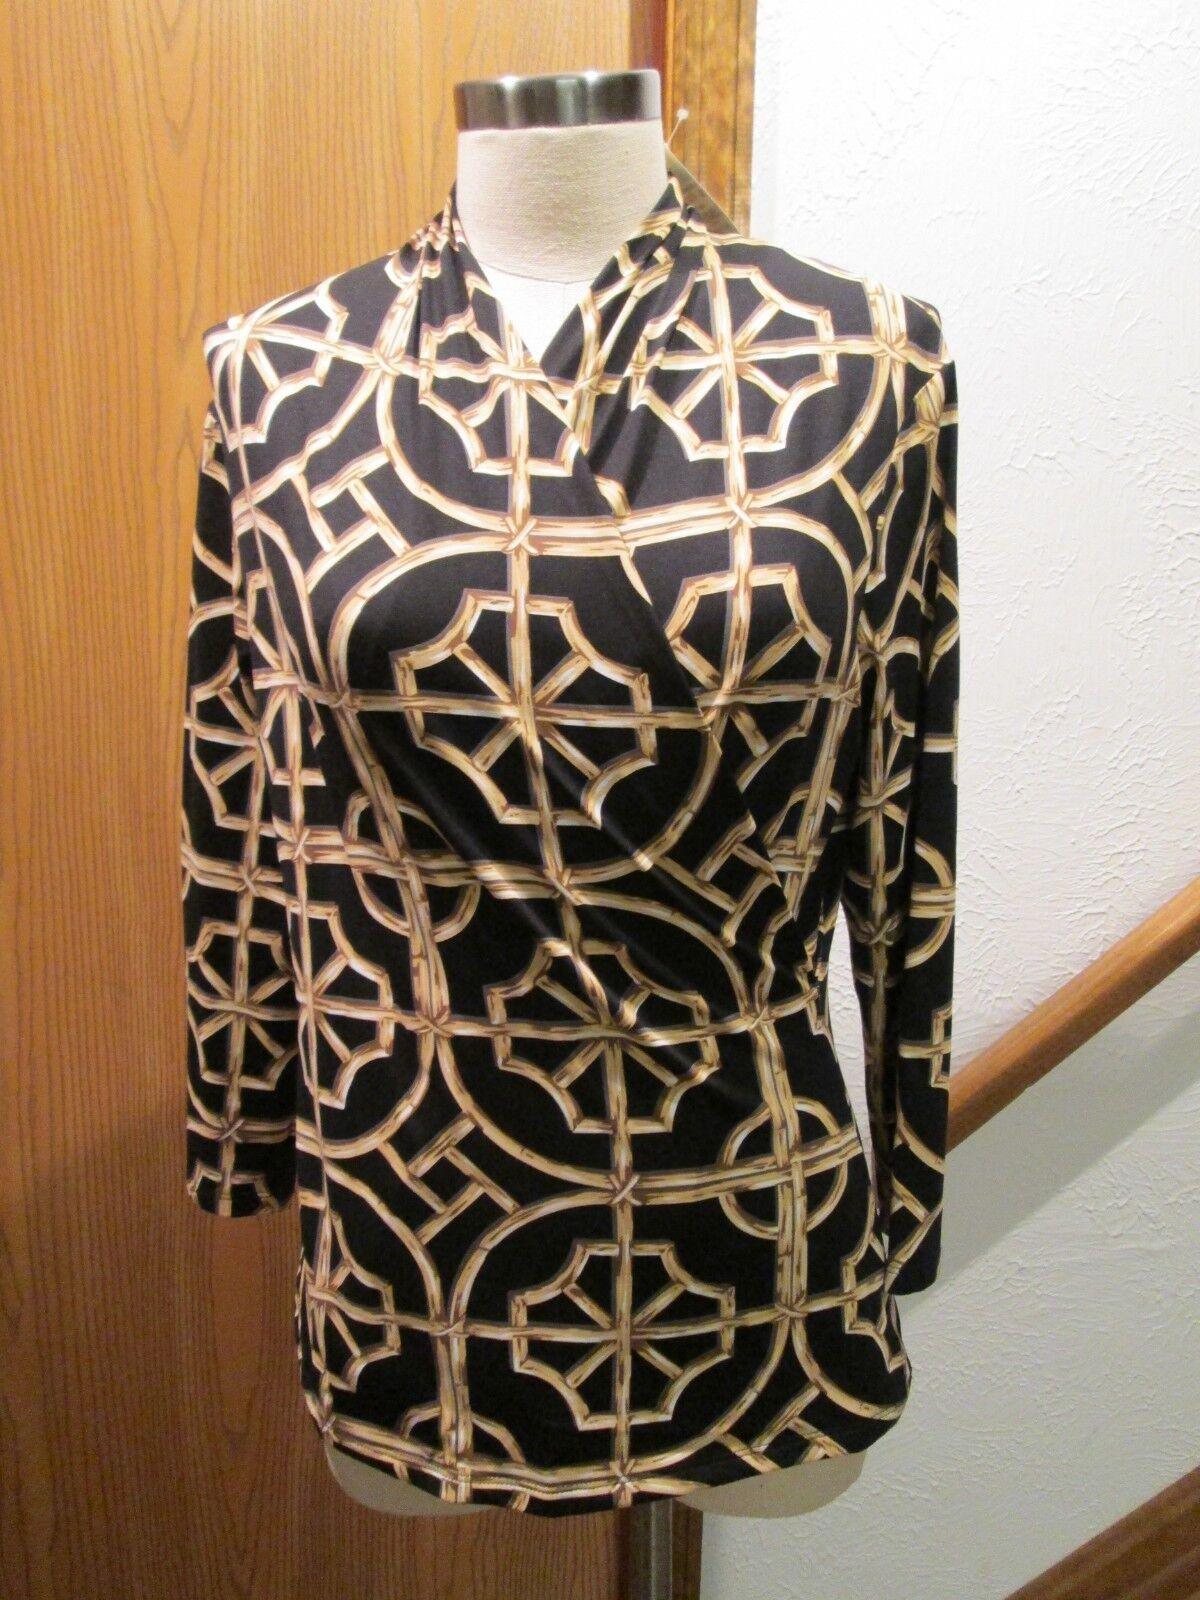 J.Mc Laughlin schwarz, Weiß & Gold Gulf 3 4 Sleeve V-Neck Knit Top Größe M